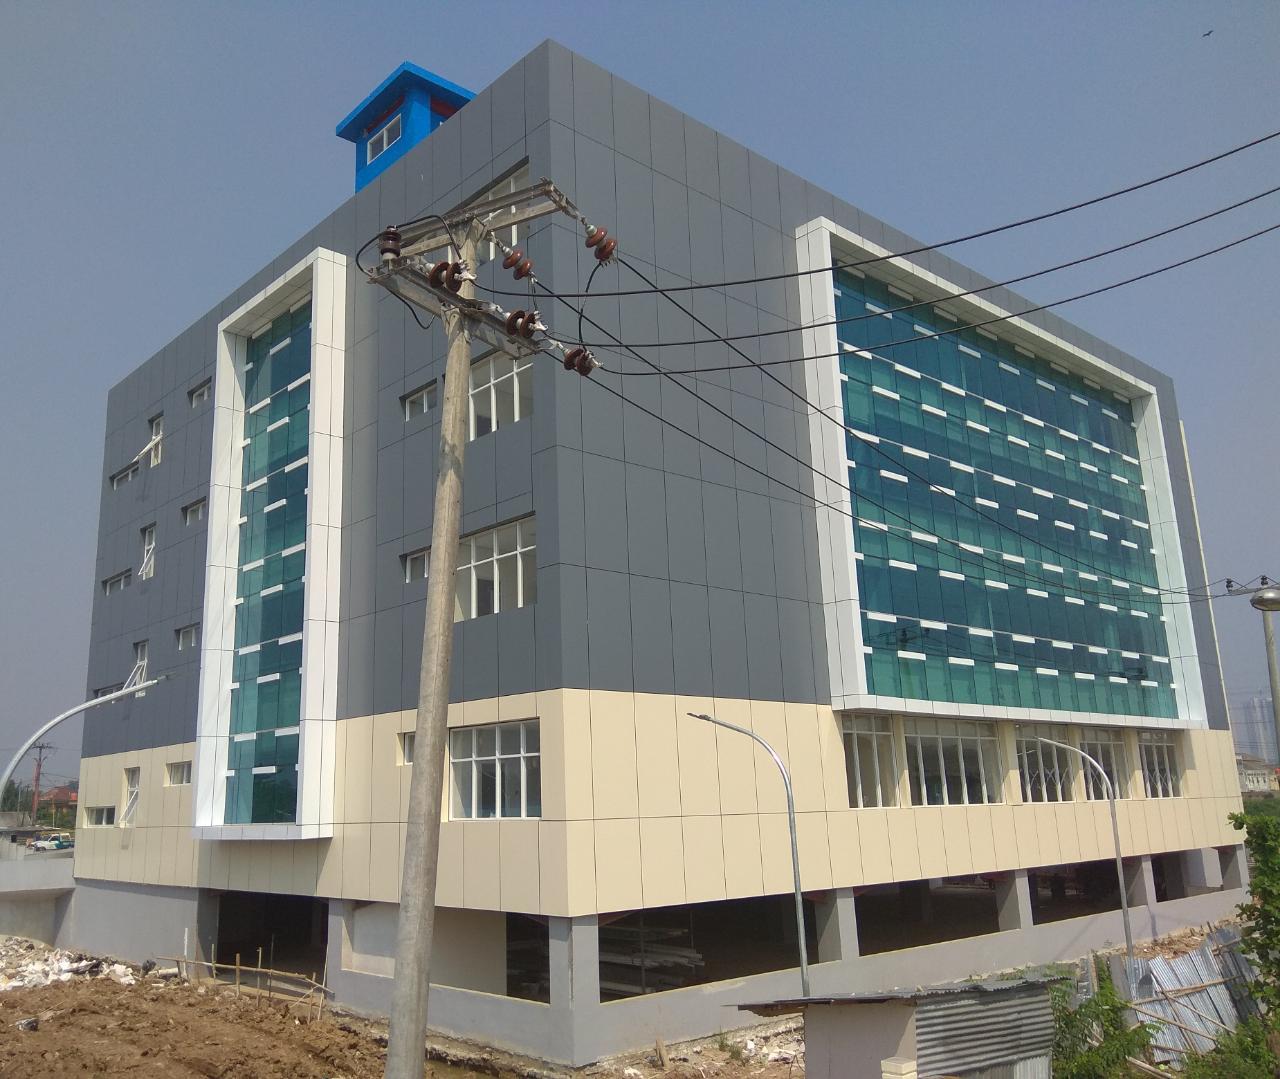 tukang pasang ACP spesialis jasa pasang aluminium composite panel Seven di Jakartaspecialist high rise building